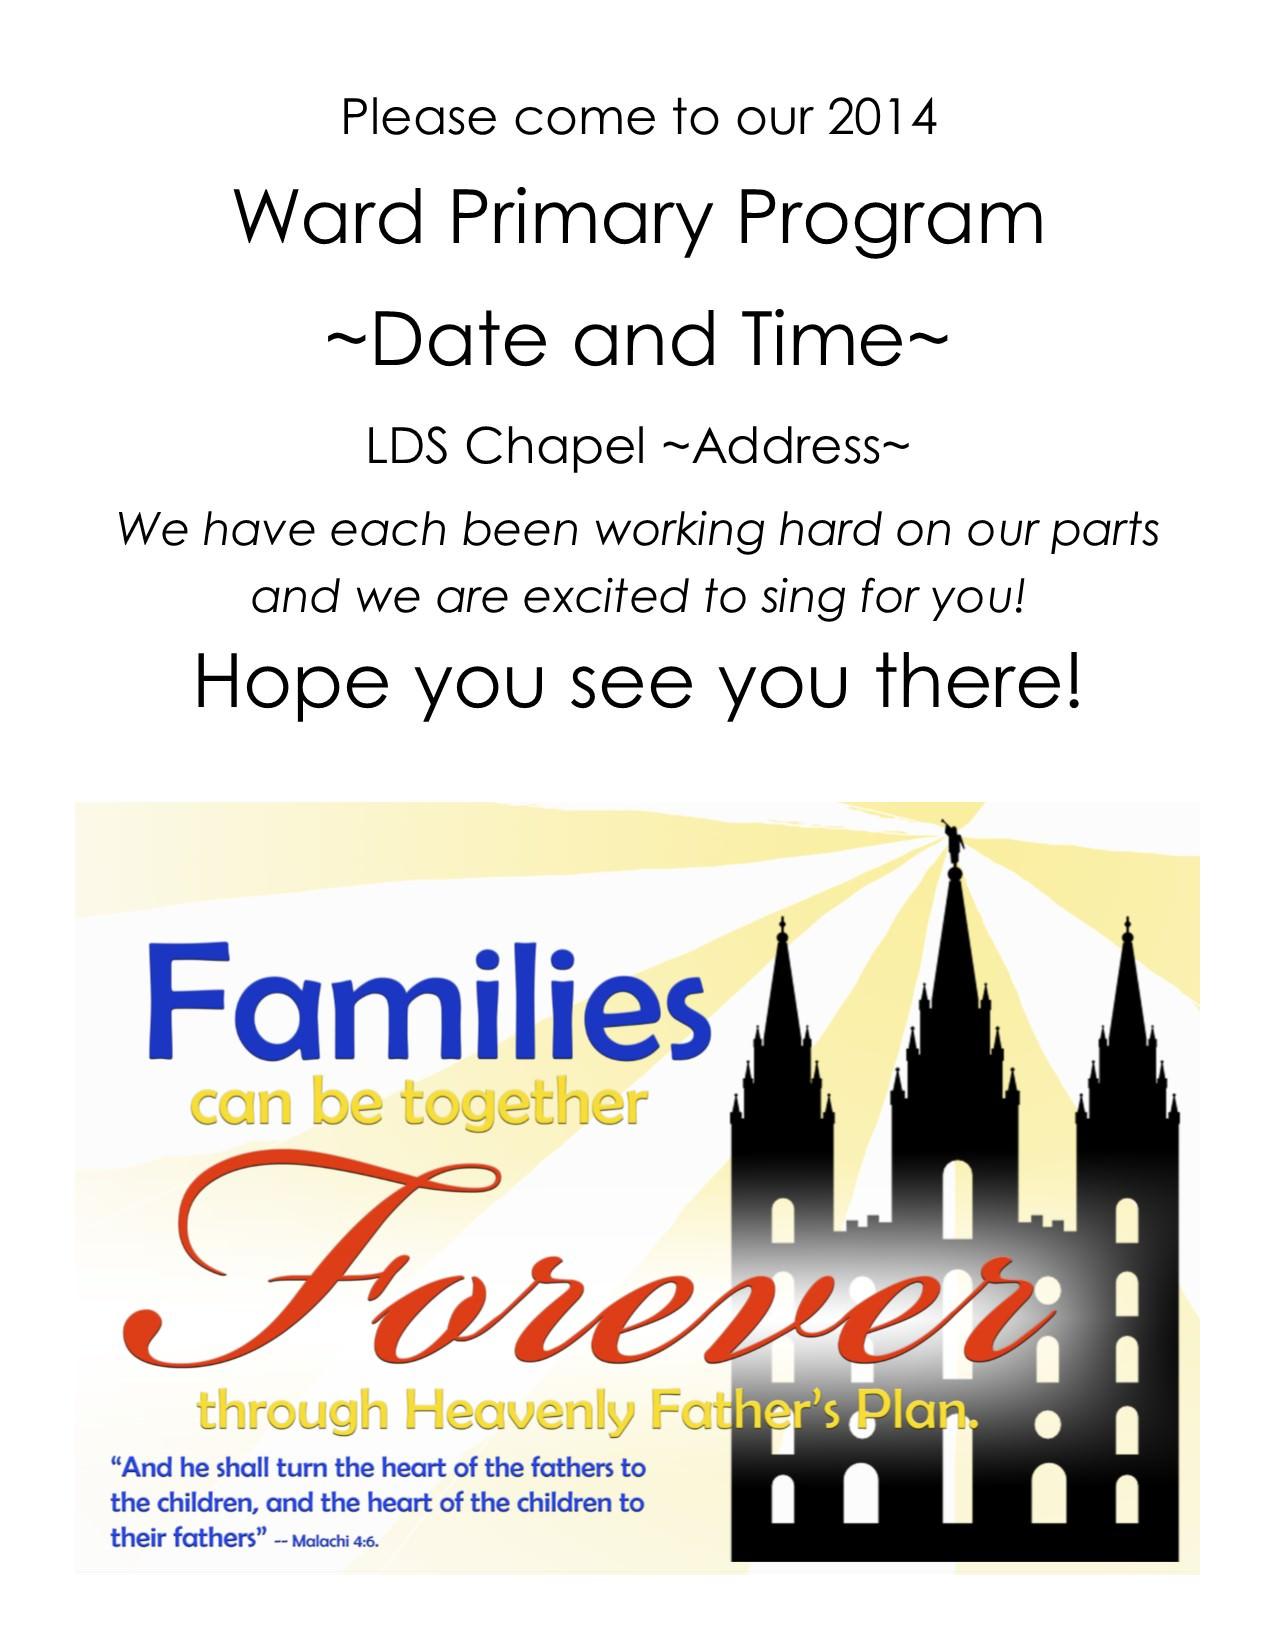 2013 lds primary program invitations | just b.CAUSE